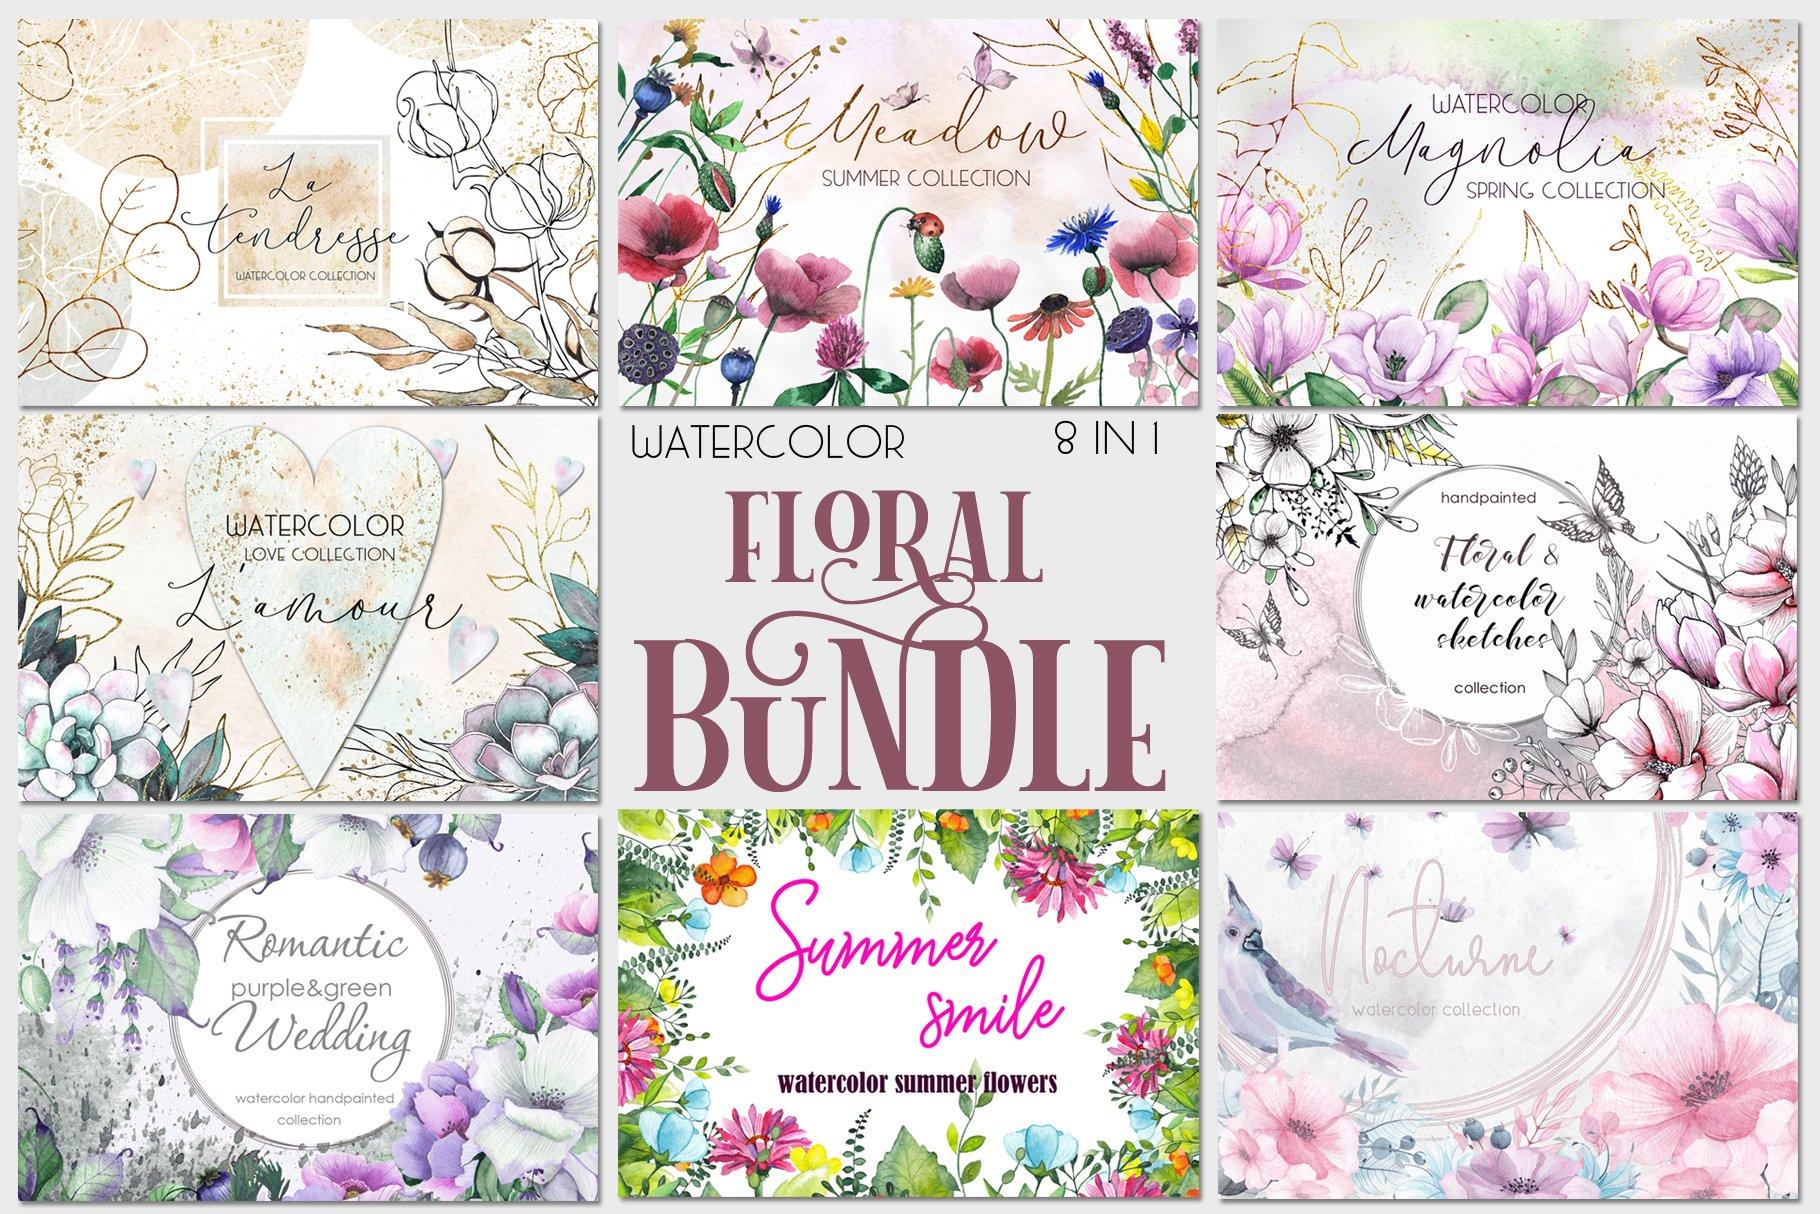 Download Watercolor Floral Bundle 515091 Illustrations Design Bundles